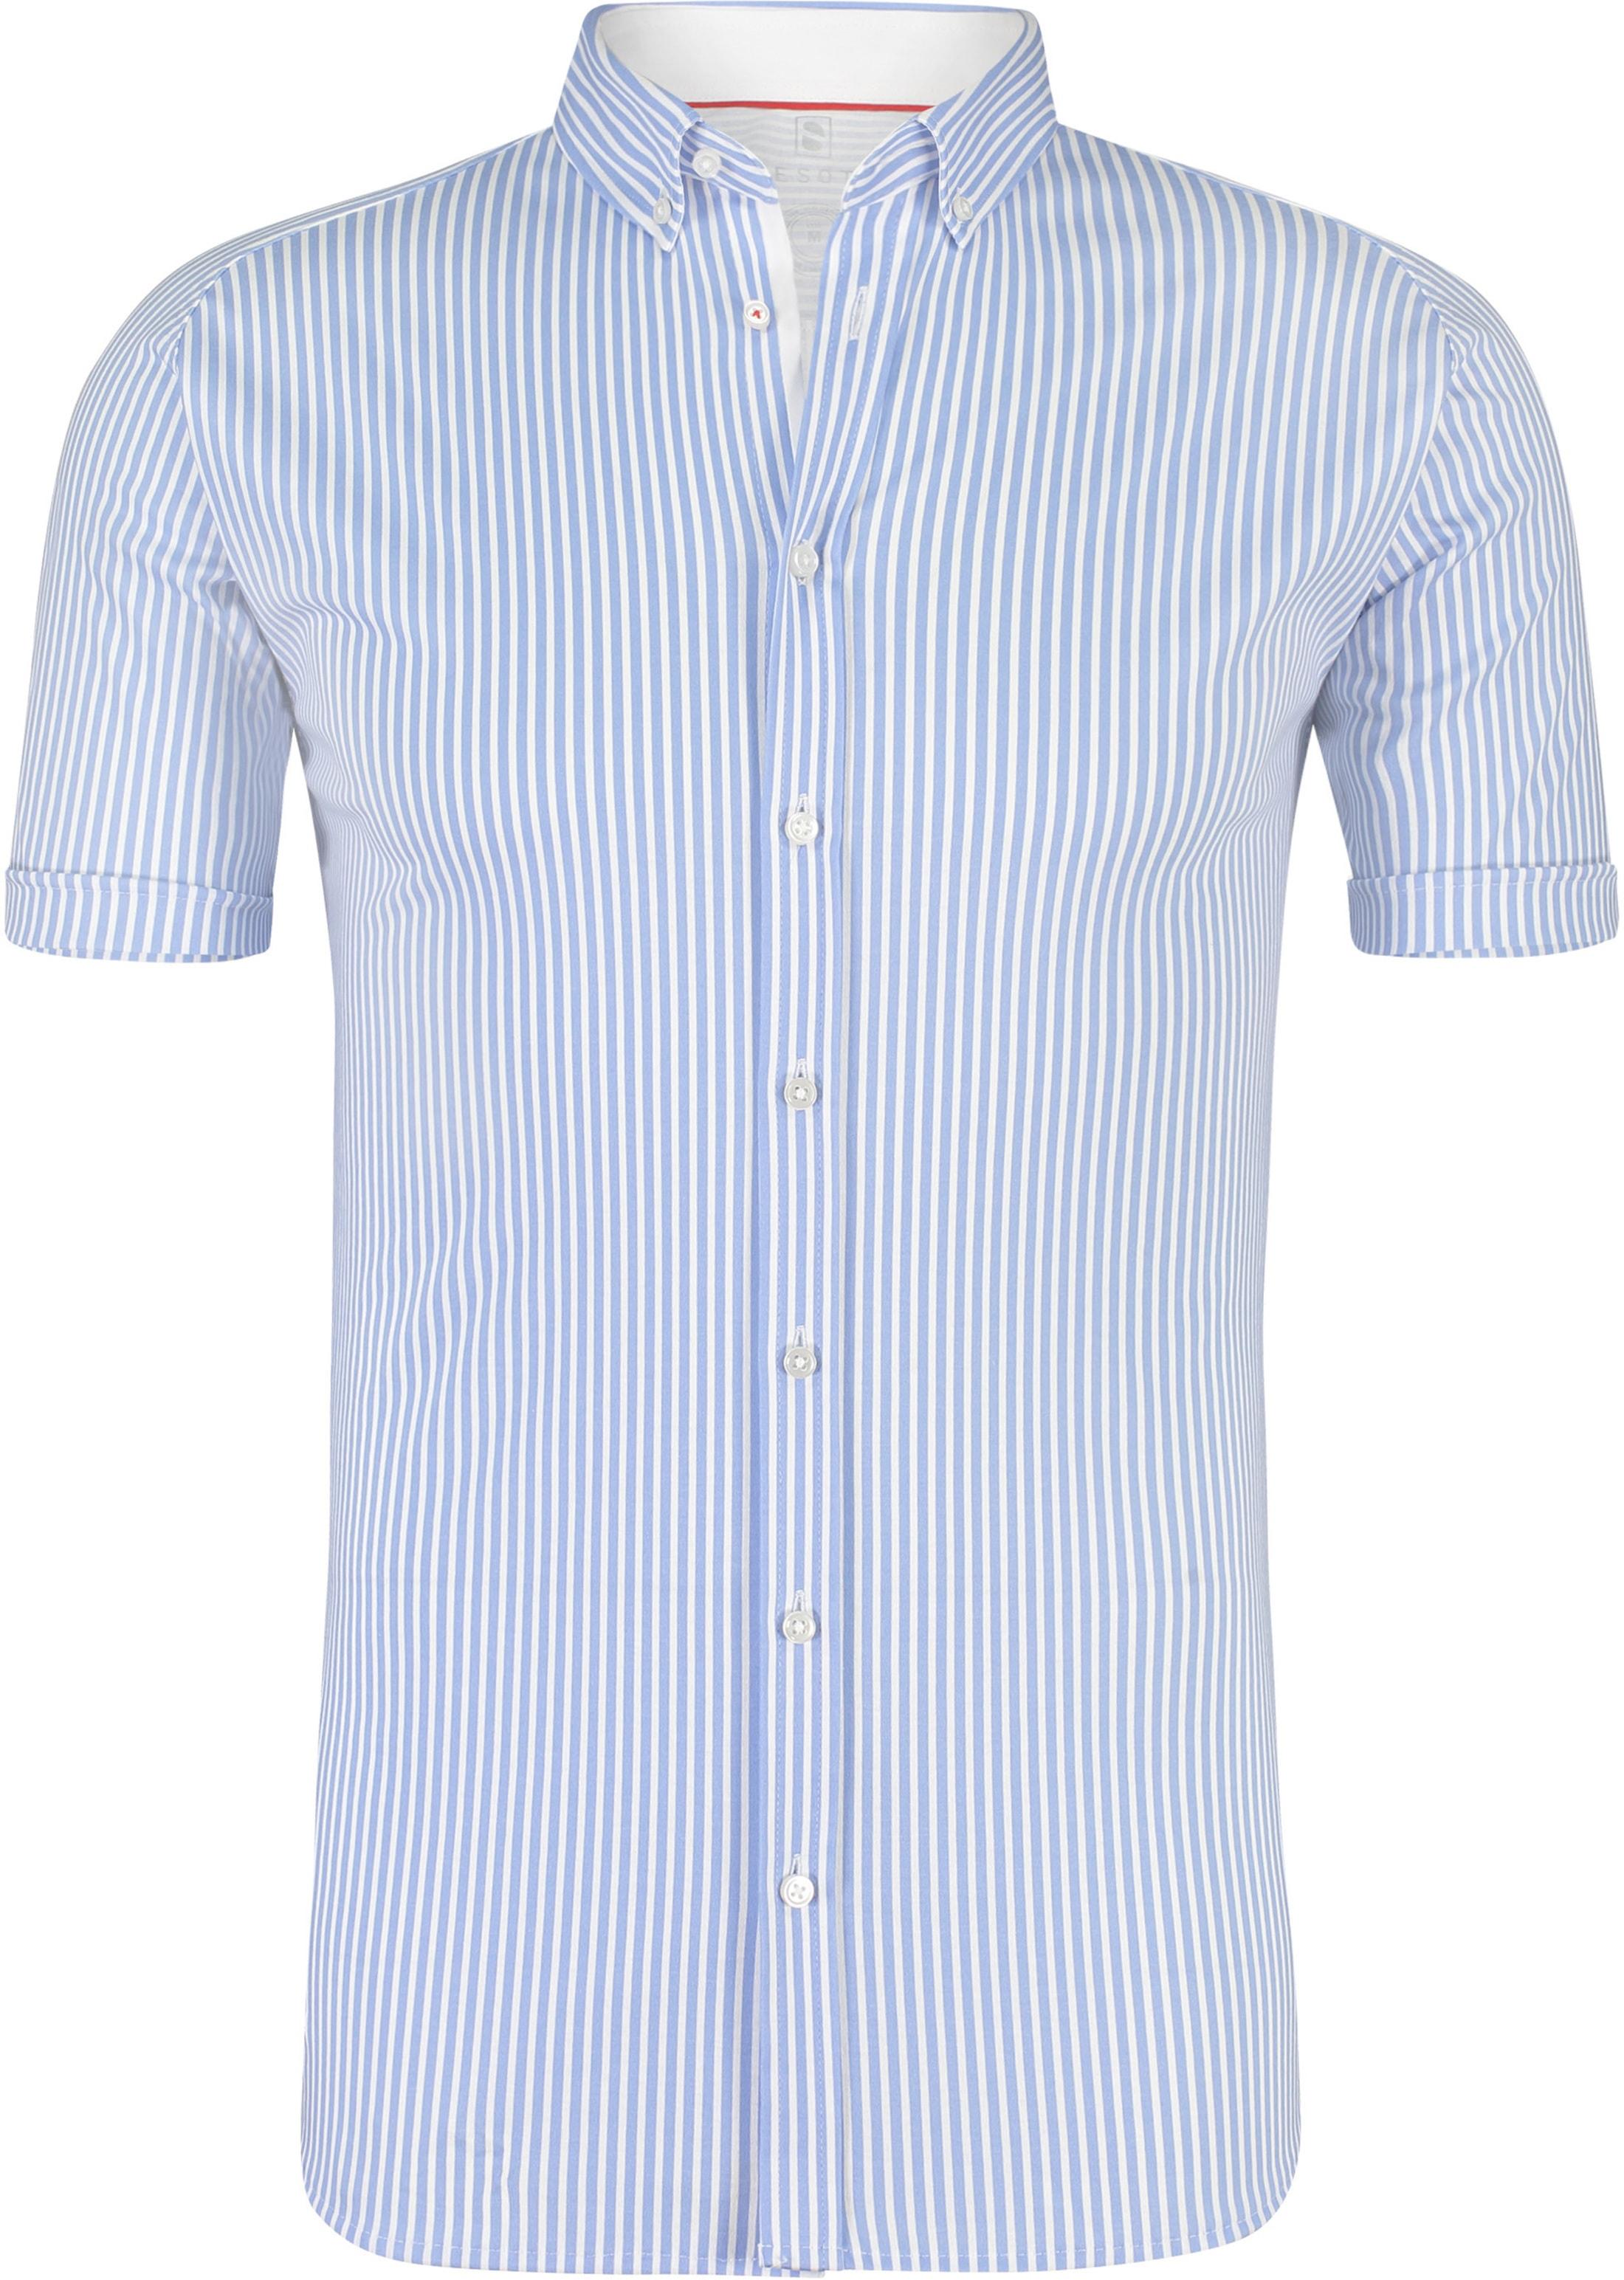 8d1c5d55c4cb Desoto Shirt Short Sleeve Striped Blue 21133-3-053 order online ...